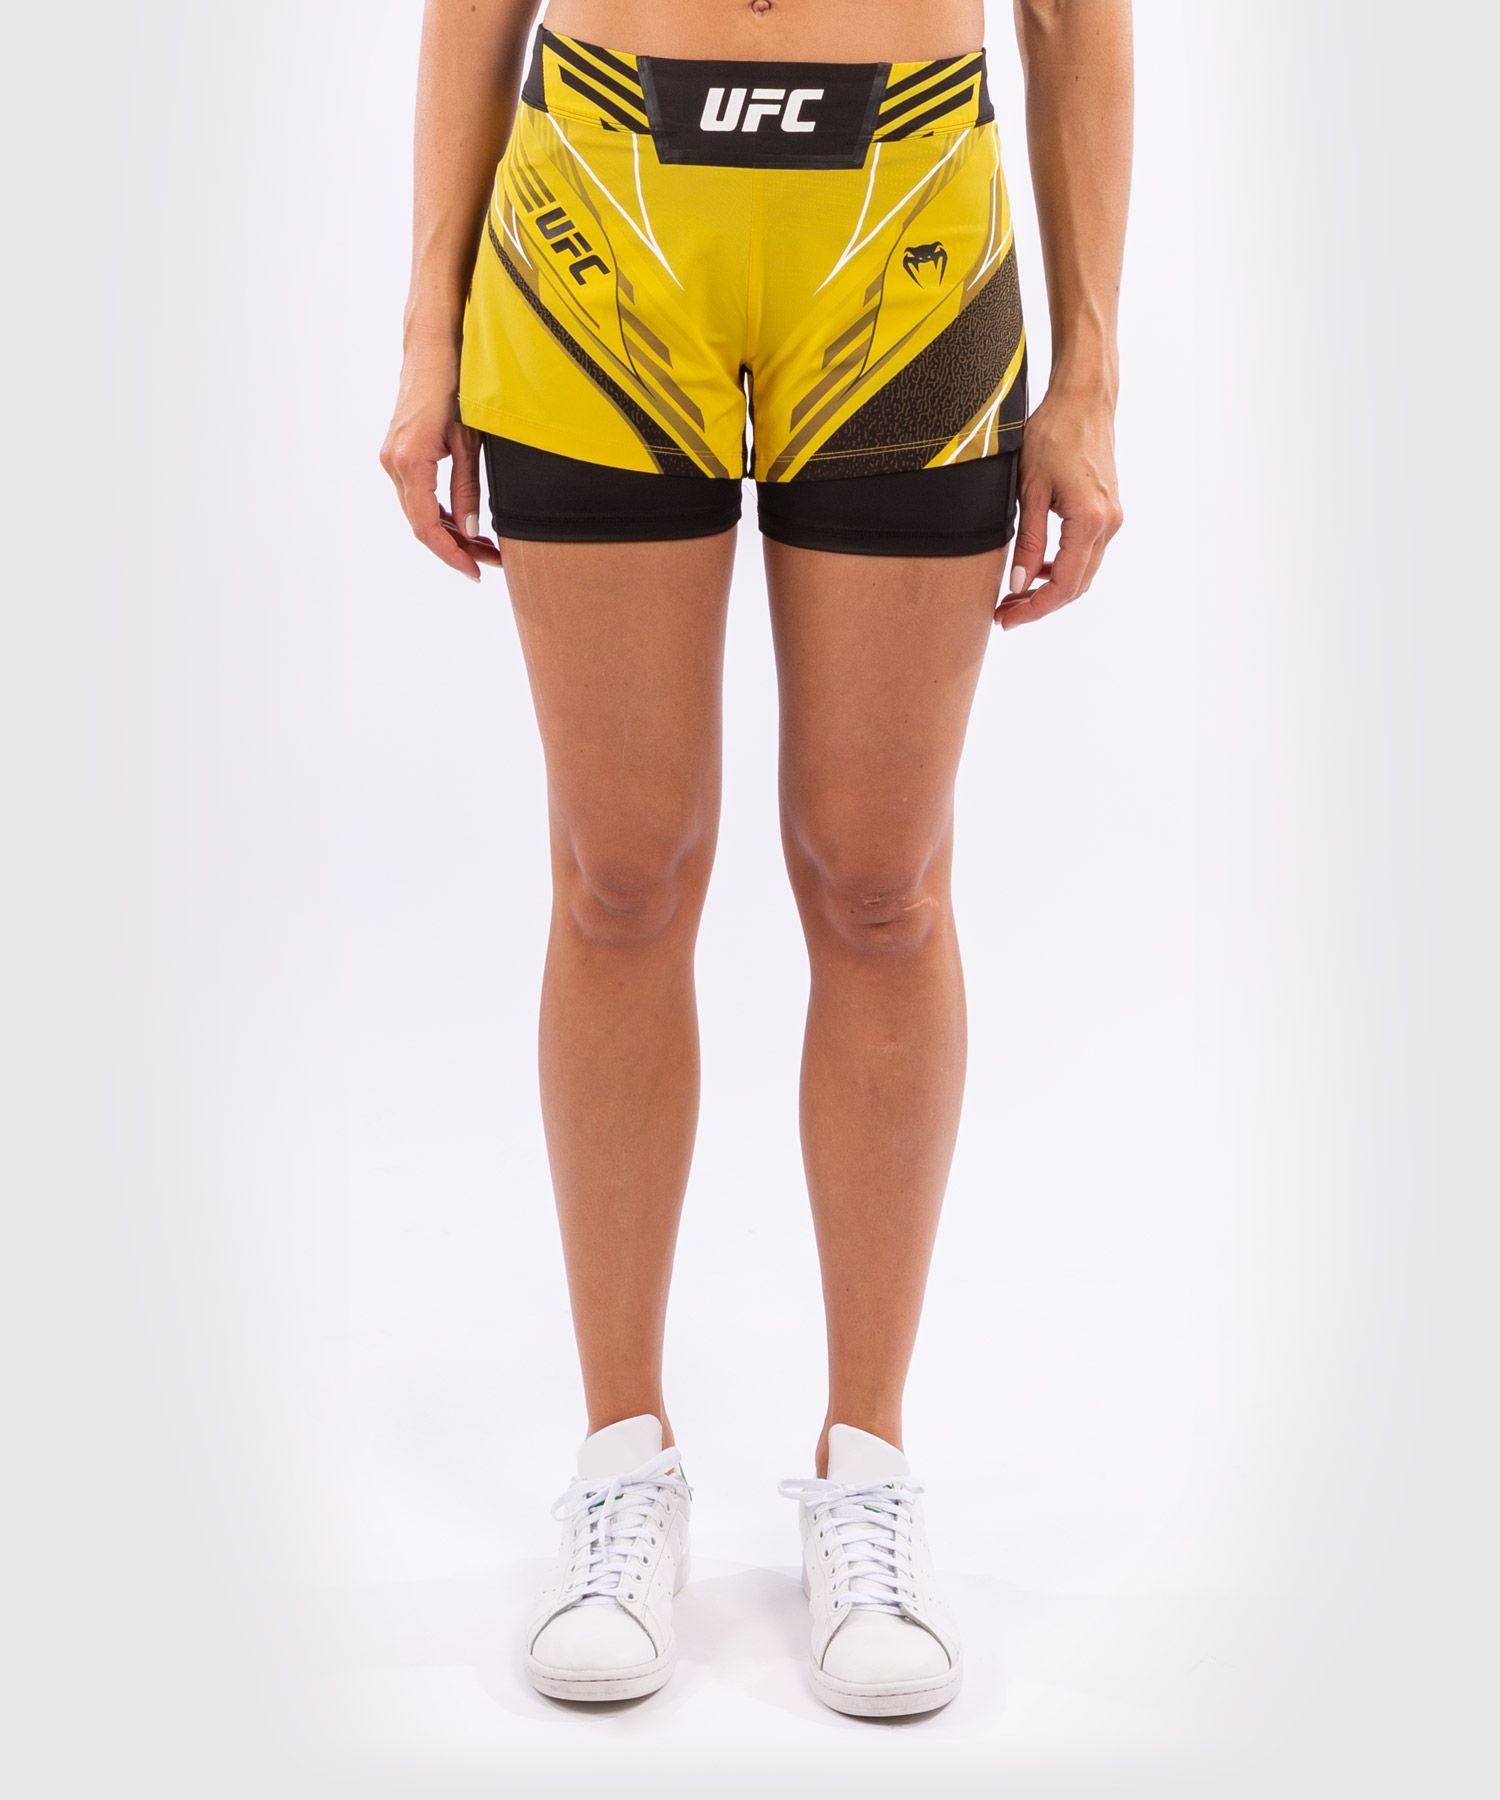 UFC Venum Authentic Fight Night Women's Shorts - Short Fit - Yellow